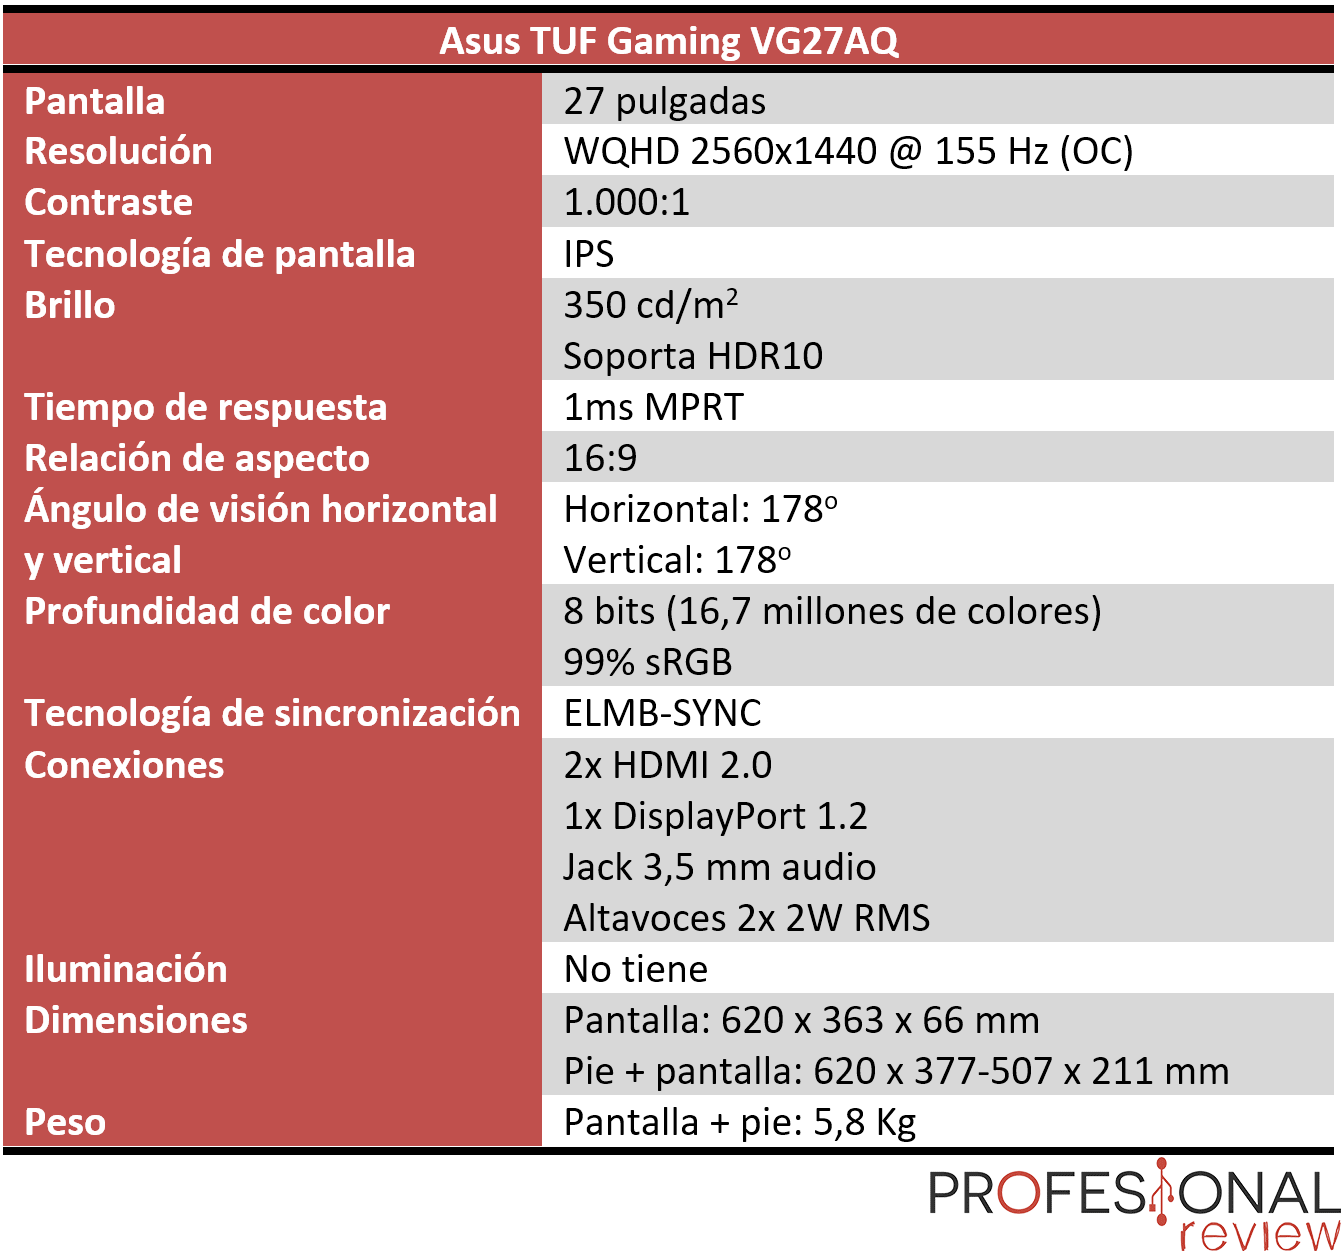 Asus TUF Gaming VG27AQ características